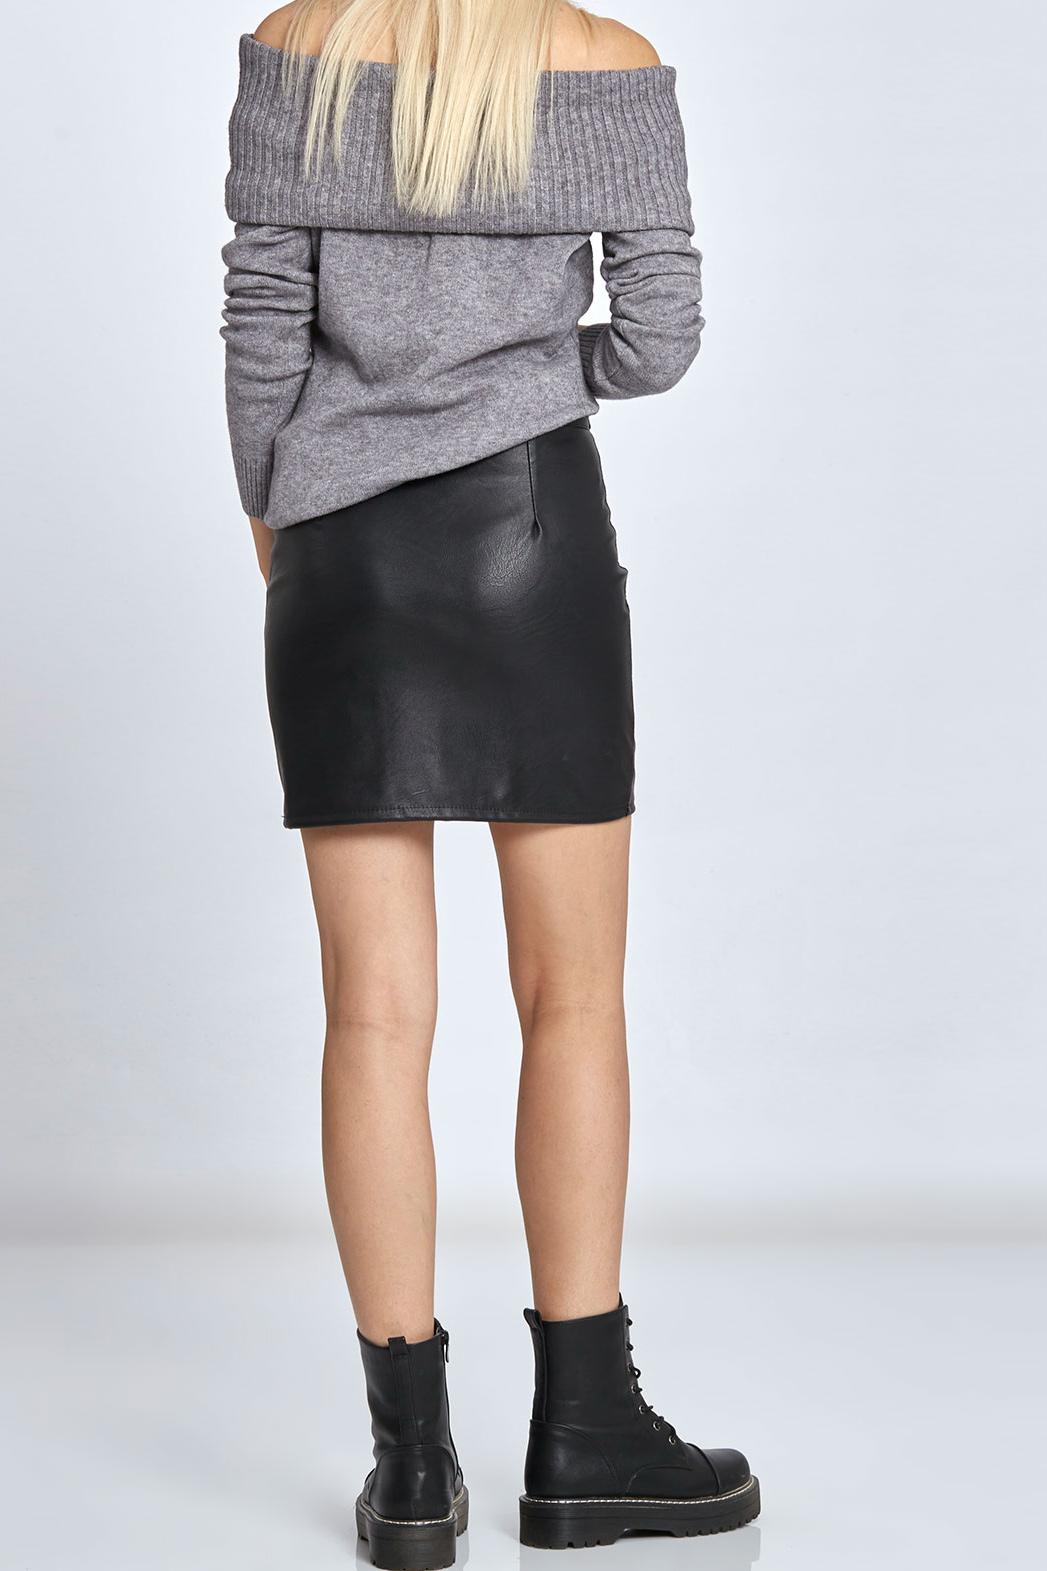 1ab3e703ca63 Μίνι φούστα από δερματίνη με φερμουάρ μπροστά μαύρη